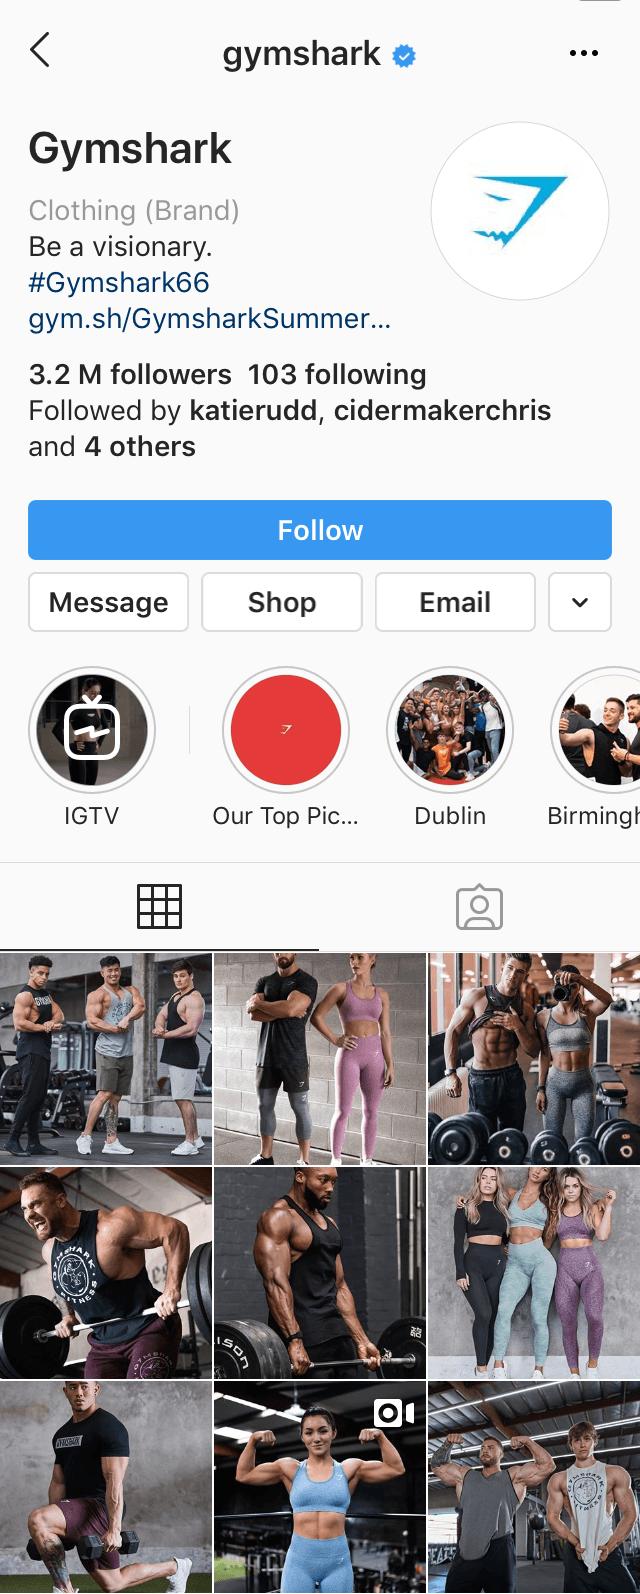 @gymshark Instagram profile